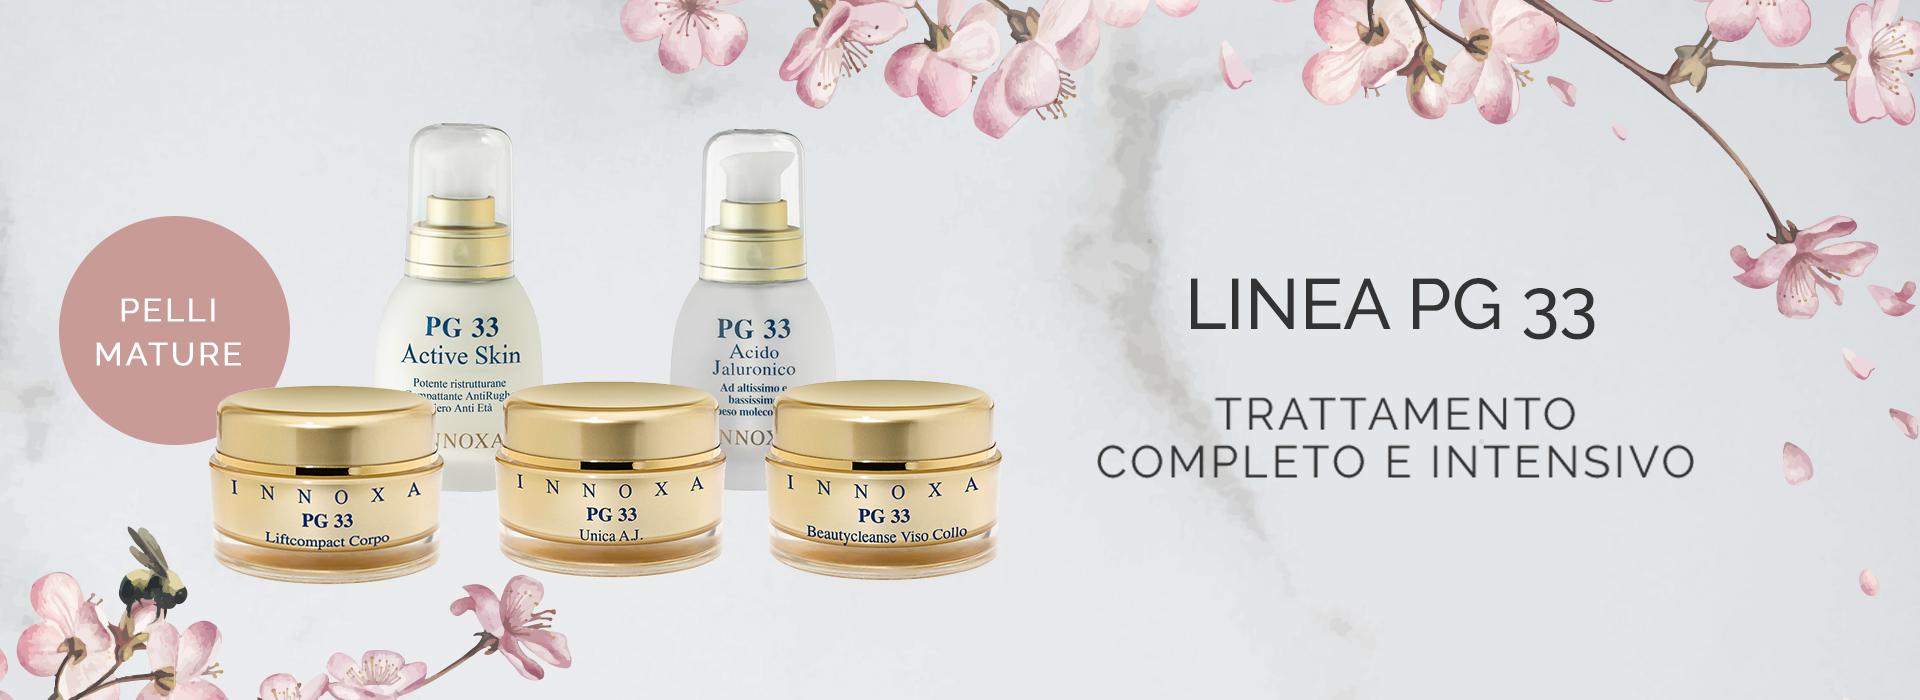 Linea PG33